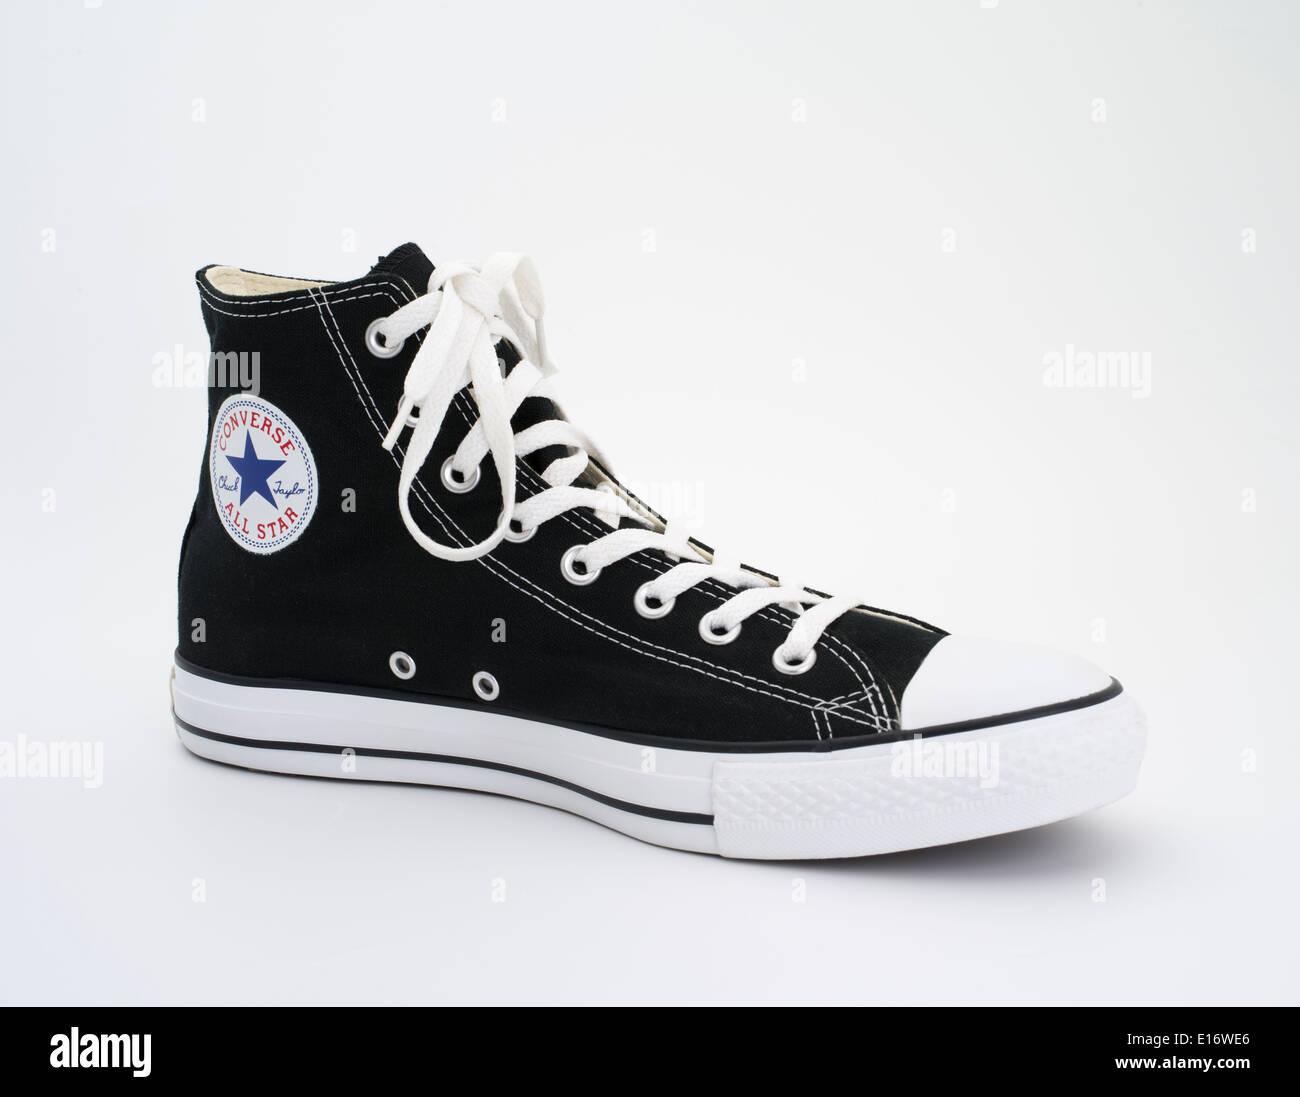 25cb307b2c0 Converse All Star Chuck Taylor en blanco y negro - Chuck Taylor All-Stars  lona